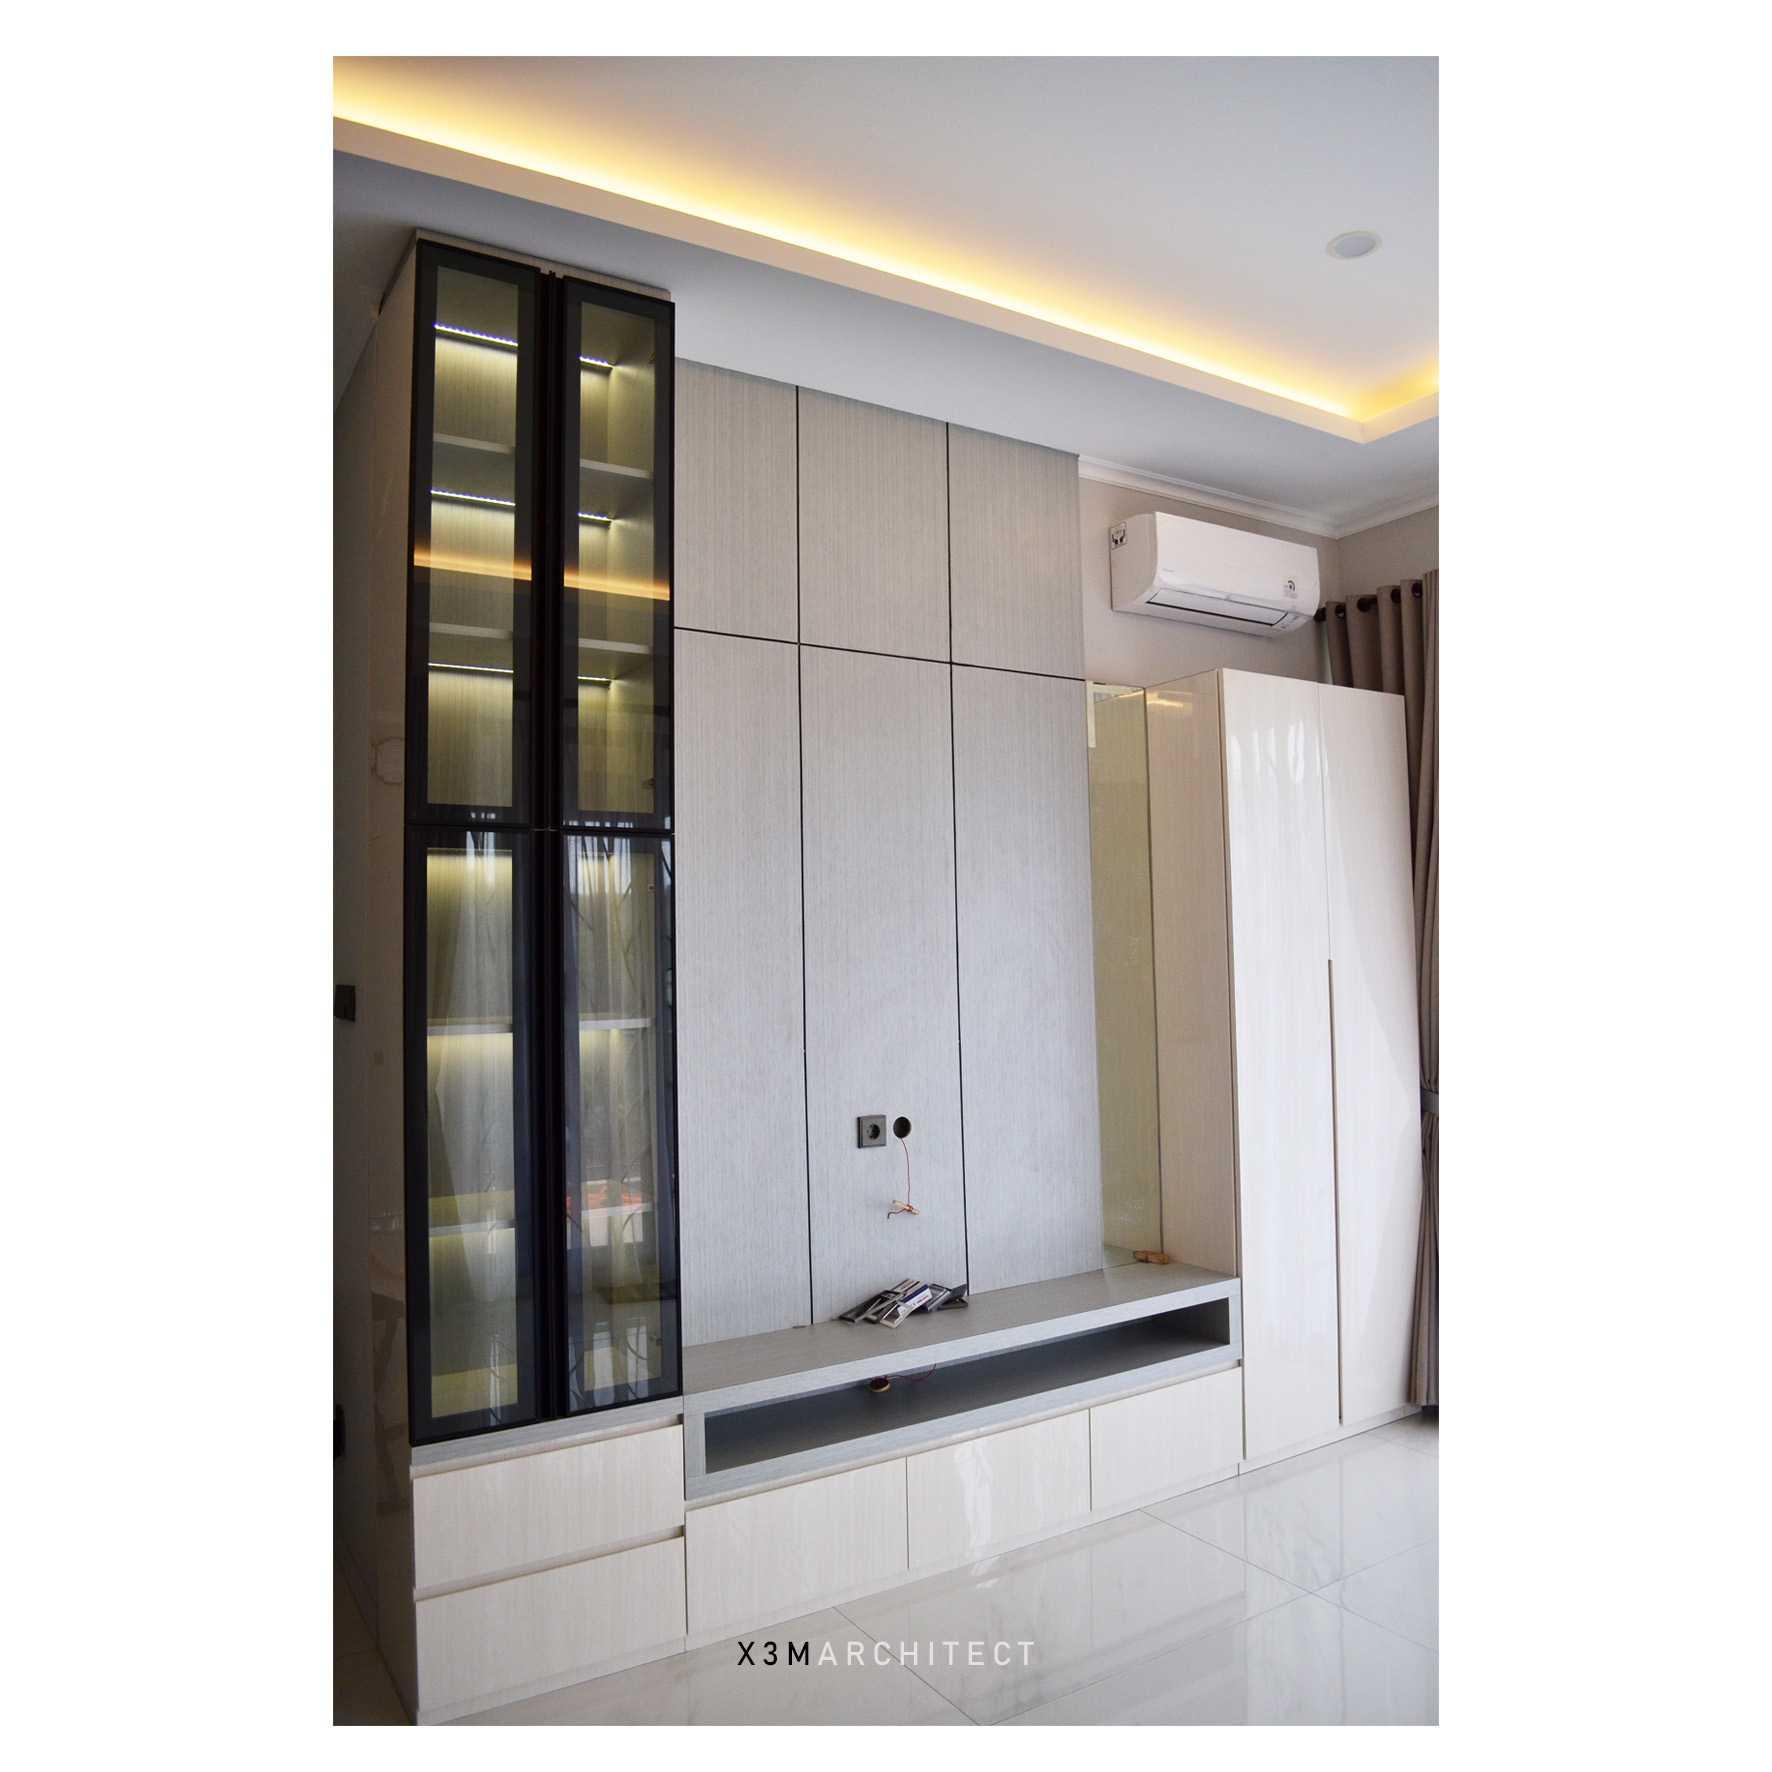 X3M Architects Nittaya A5 1 House Sampora, Kec. Cisauk, Tangerang, Banten 15345, Indonesia Sampora, Kec. Cisauk, Tangerang, Banten 15345, Indonesia X3M-Architects-Nittaya-A5-1-House  80366